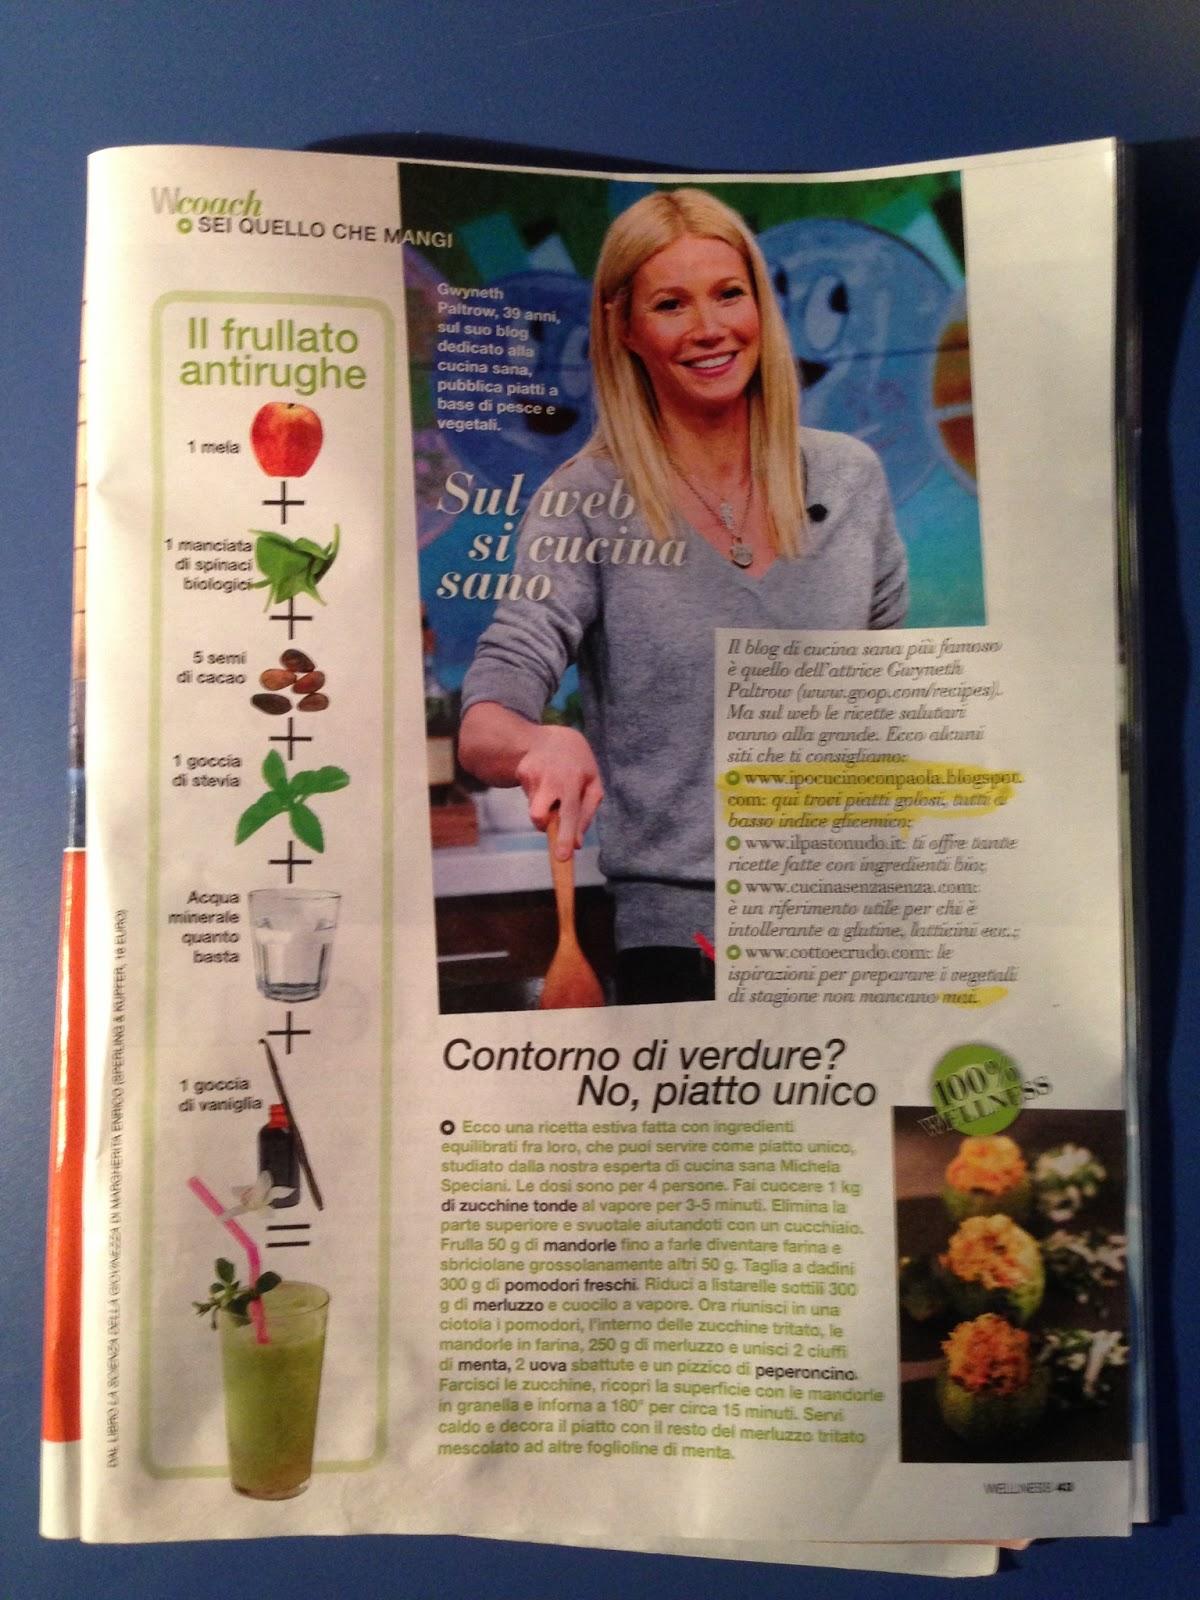 donna moderna wellness si parla del mio blog!!!!